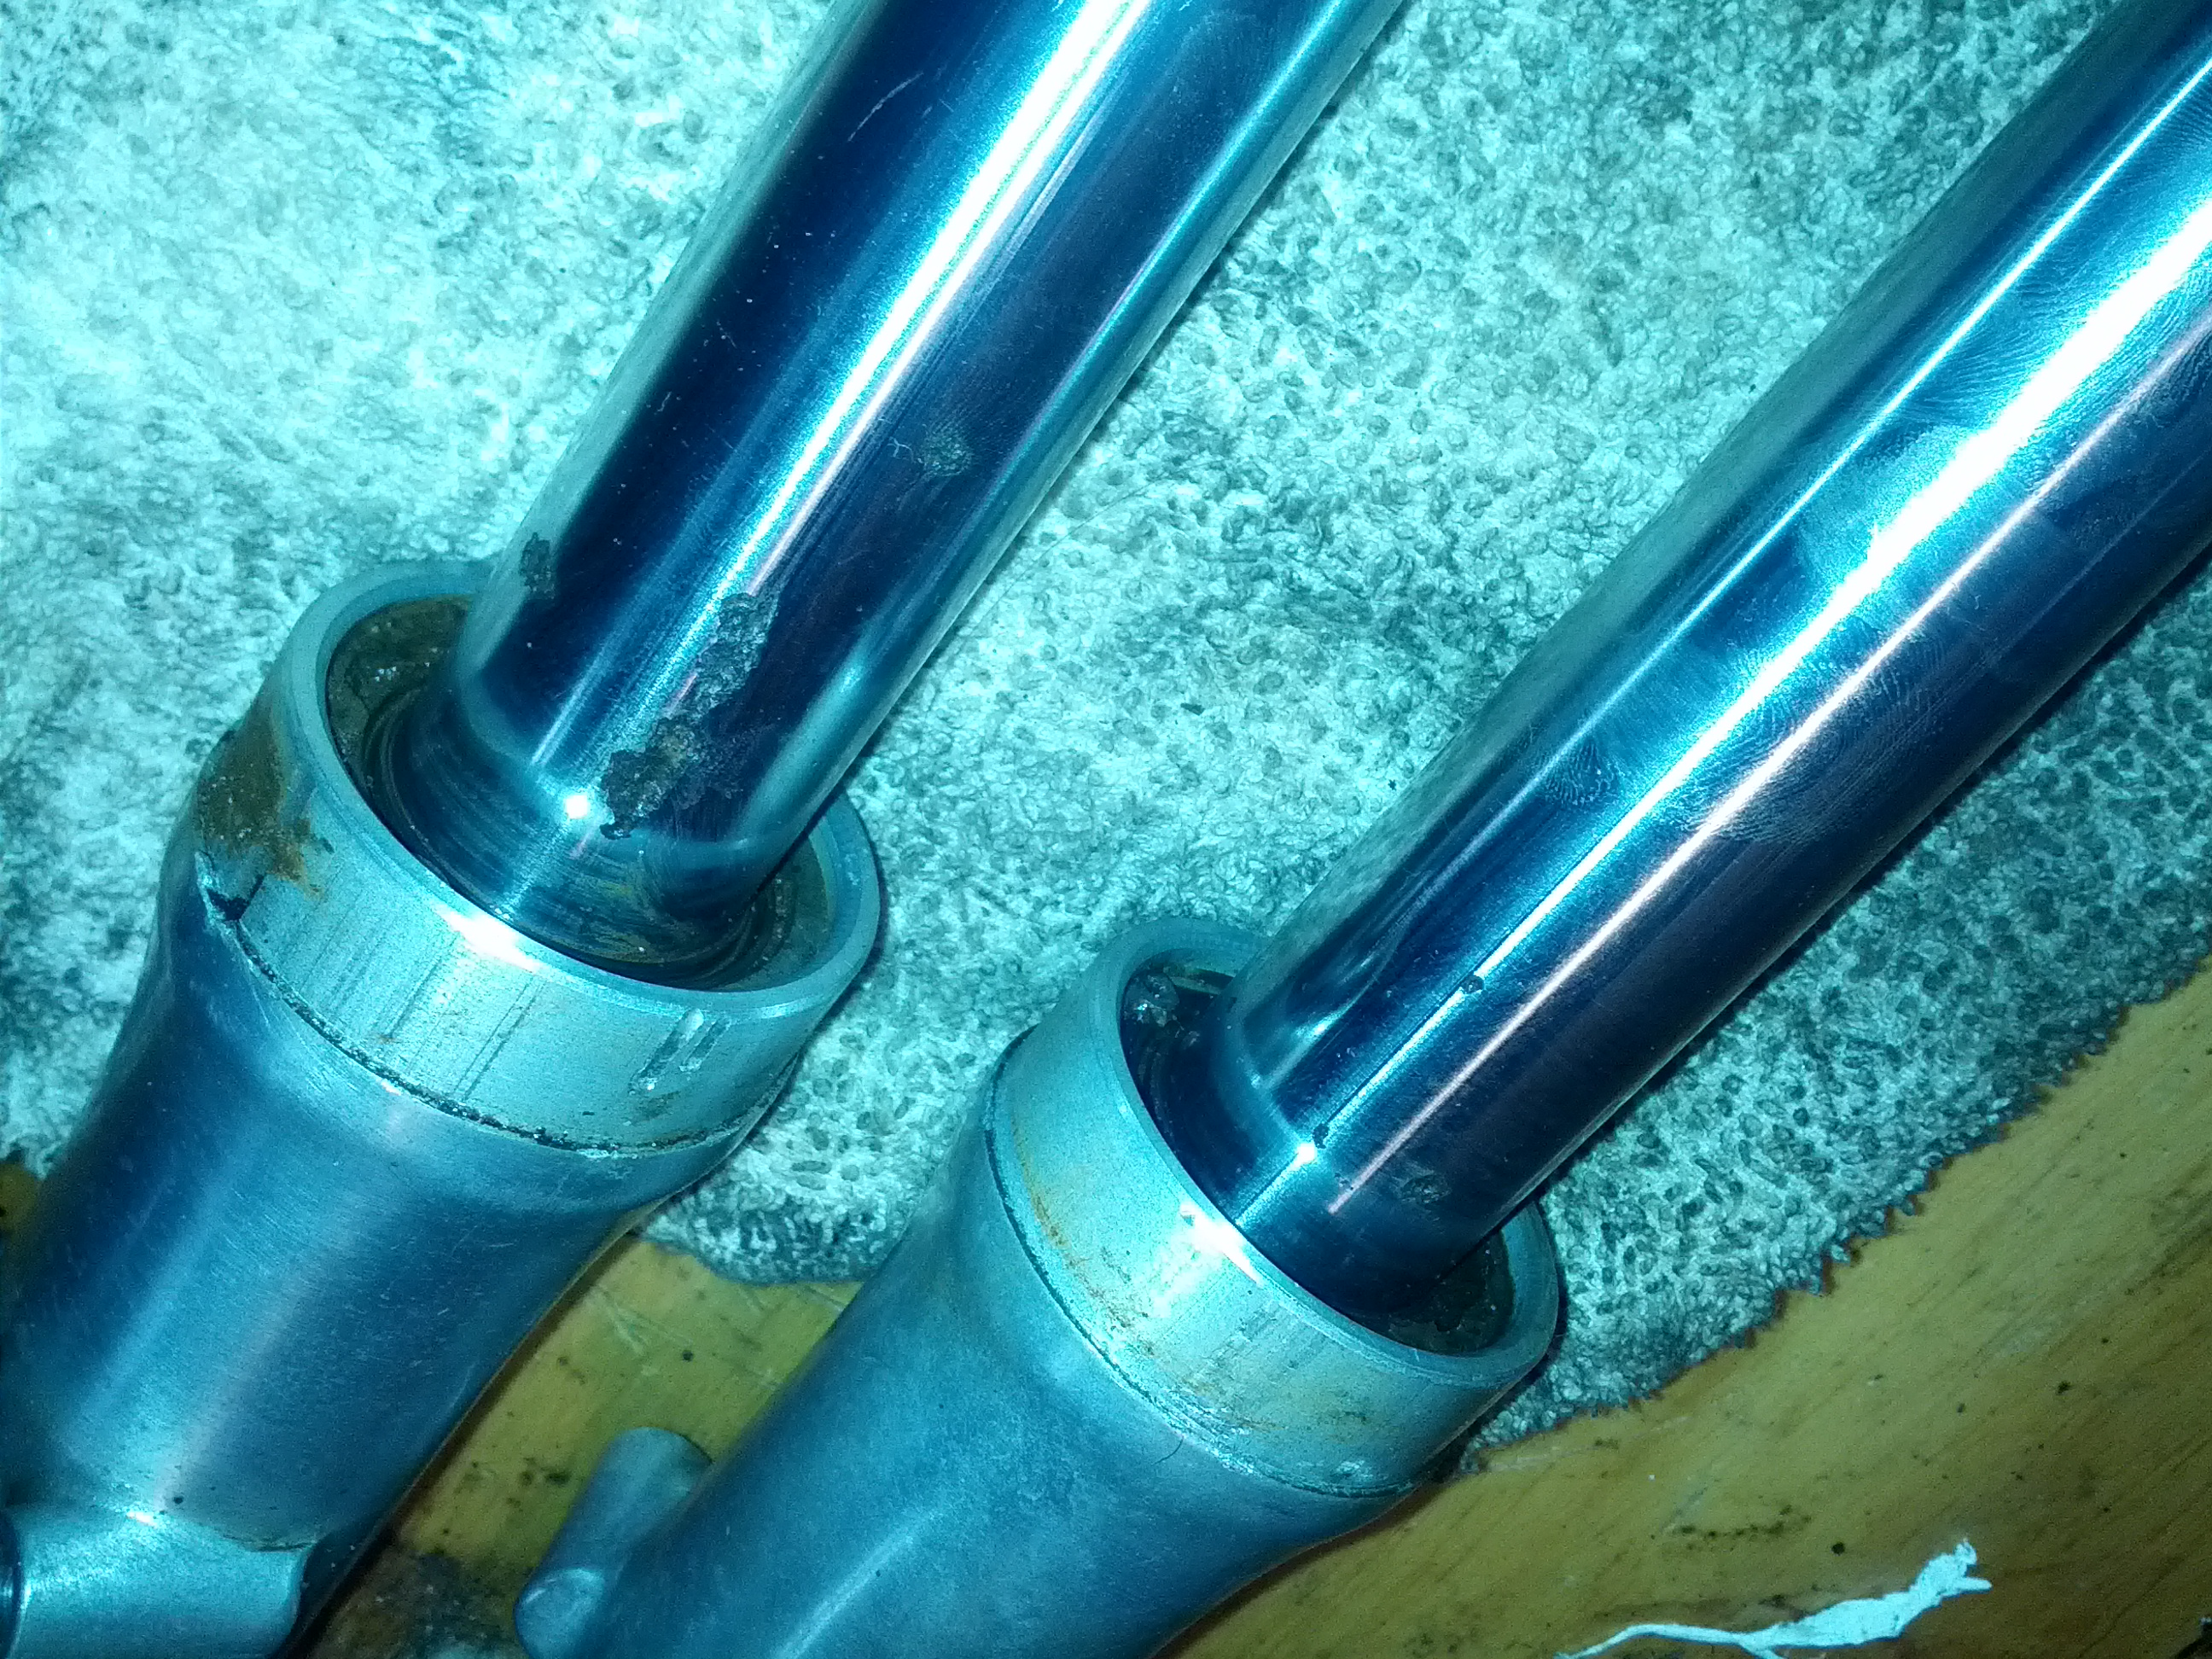 U0026 39 73 Cb175 K7 Fork Rebuild Questions